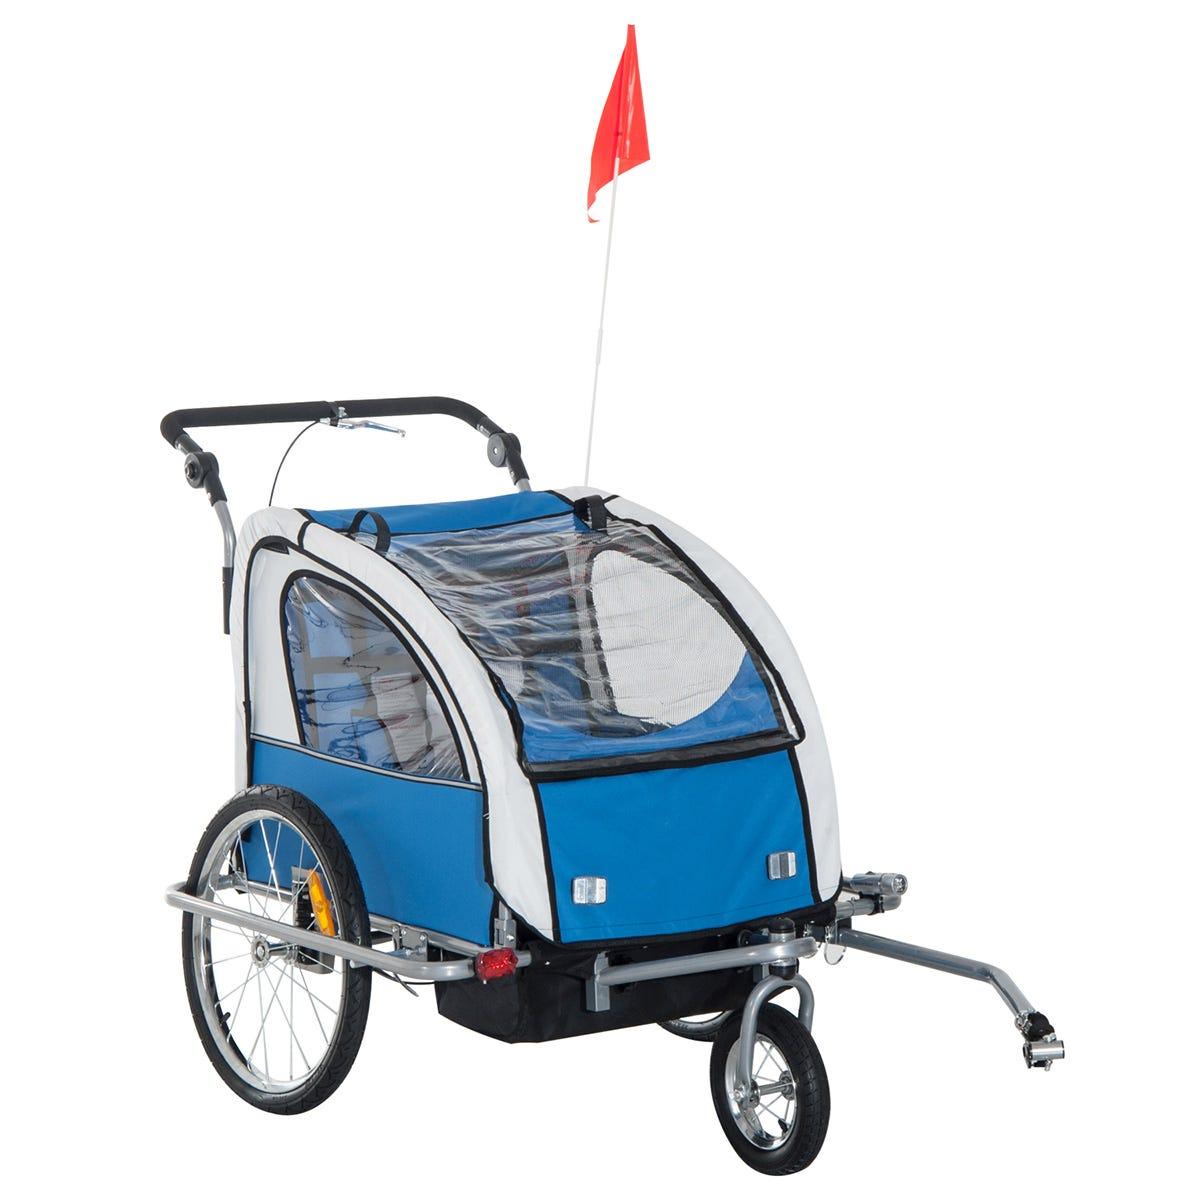 Reiten 2-in-1 Kids Bike Trailer & Stroller with Removable Canopy - Blue/Grey